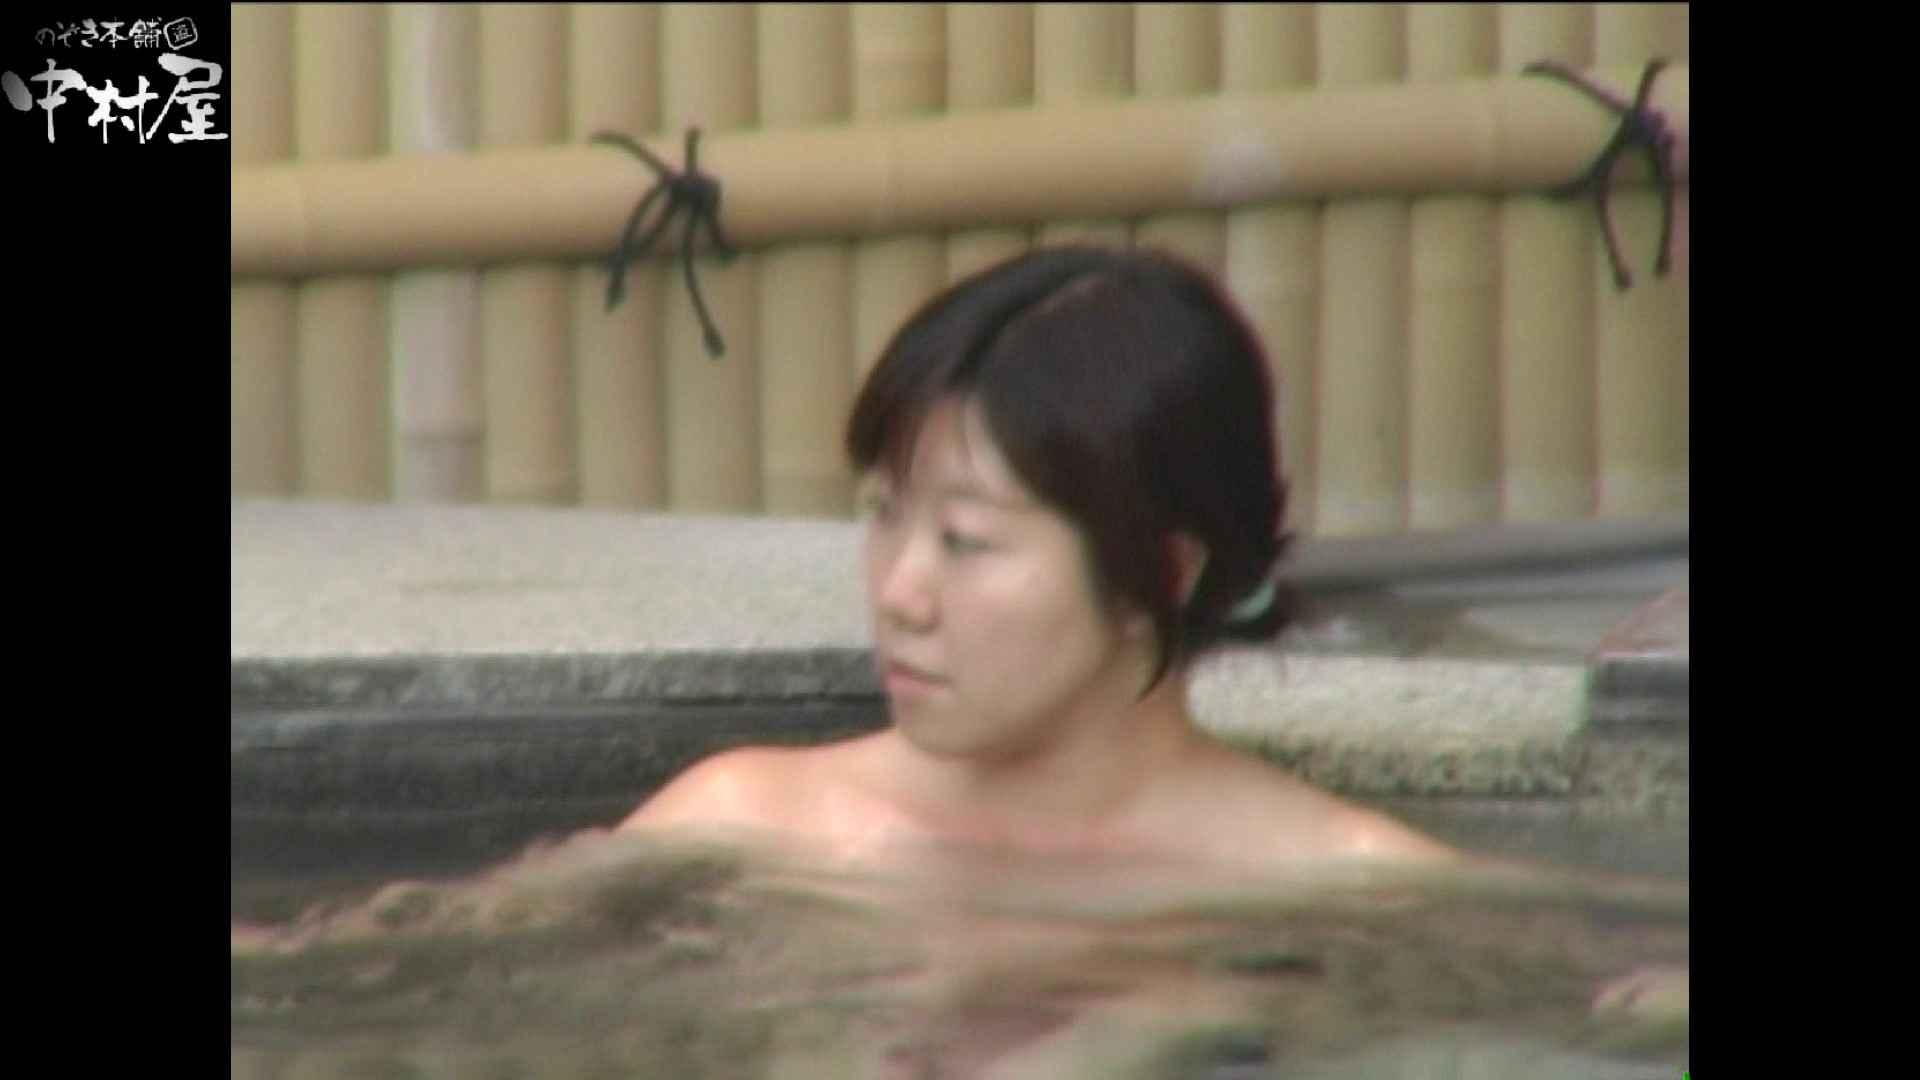 Aquaな露天風呂Vol.977 盗撮師作品 | 露天風呂突入  83pic 13